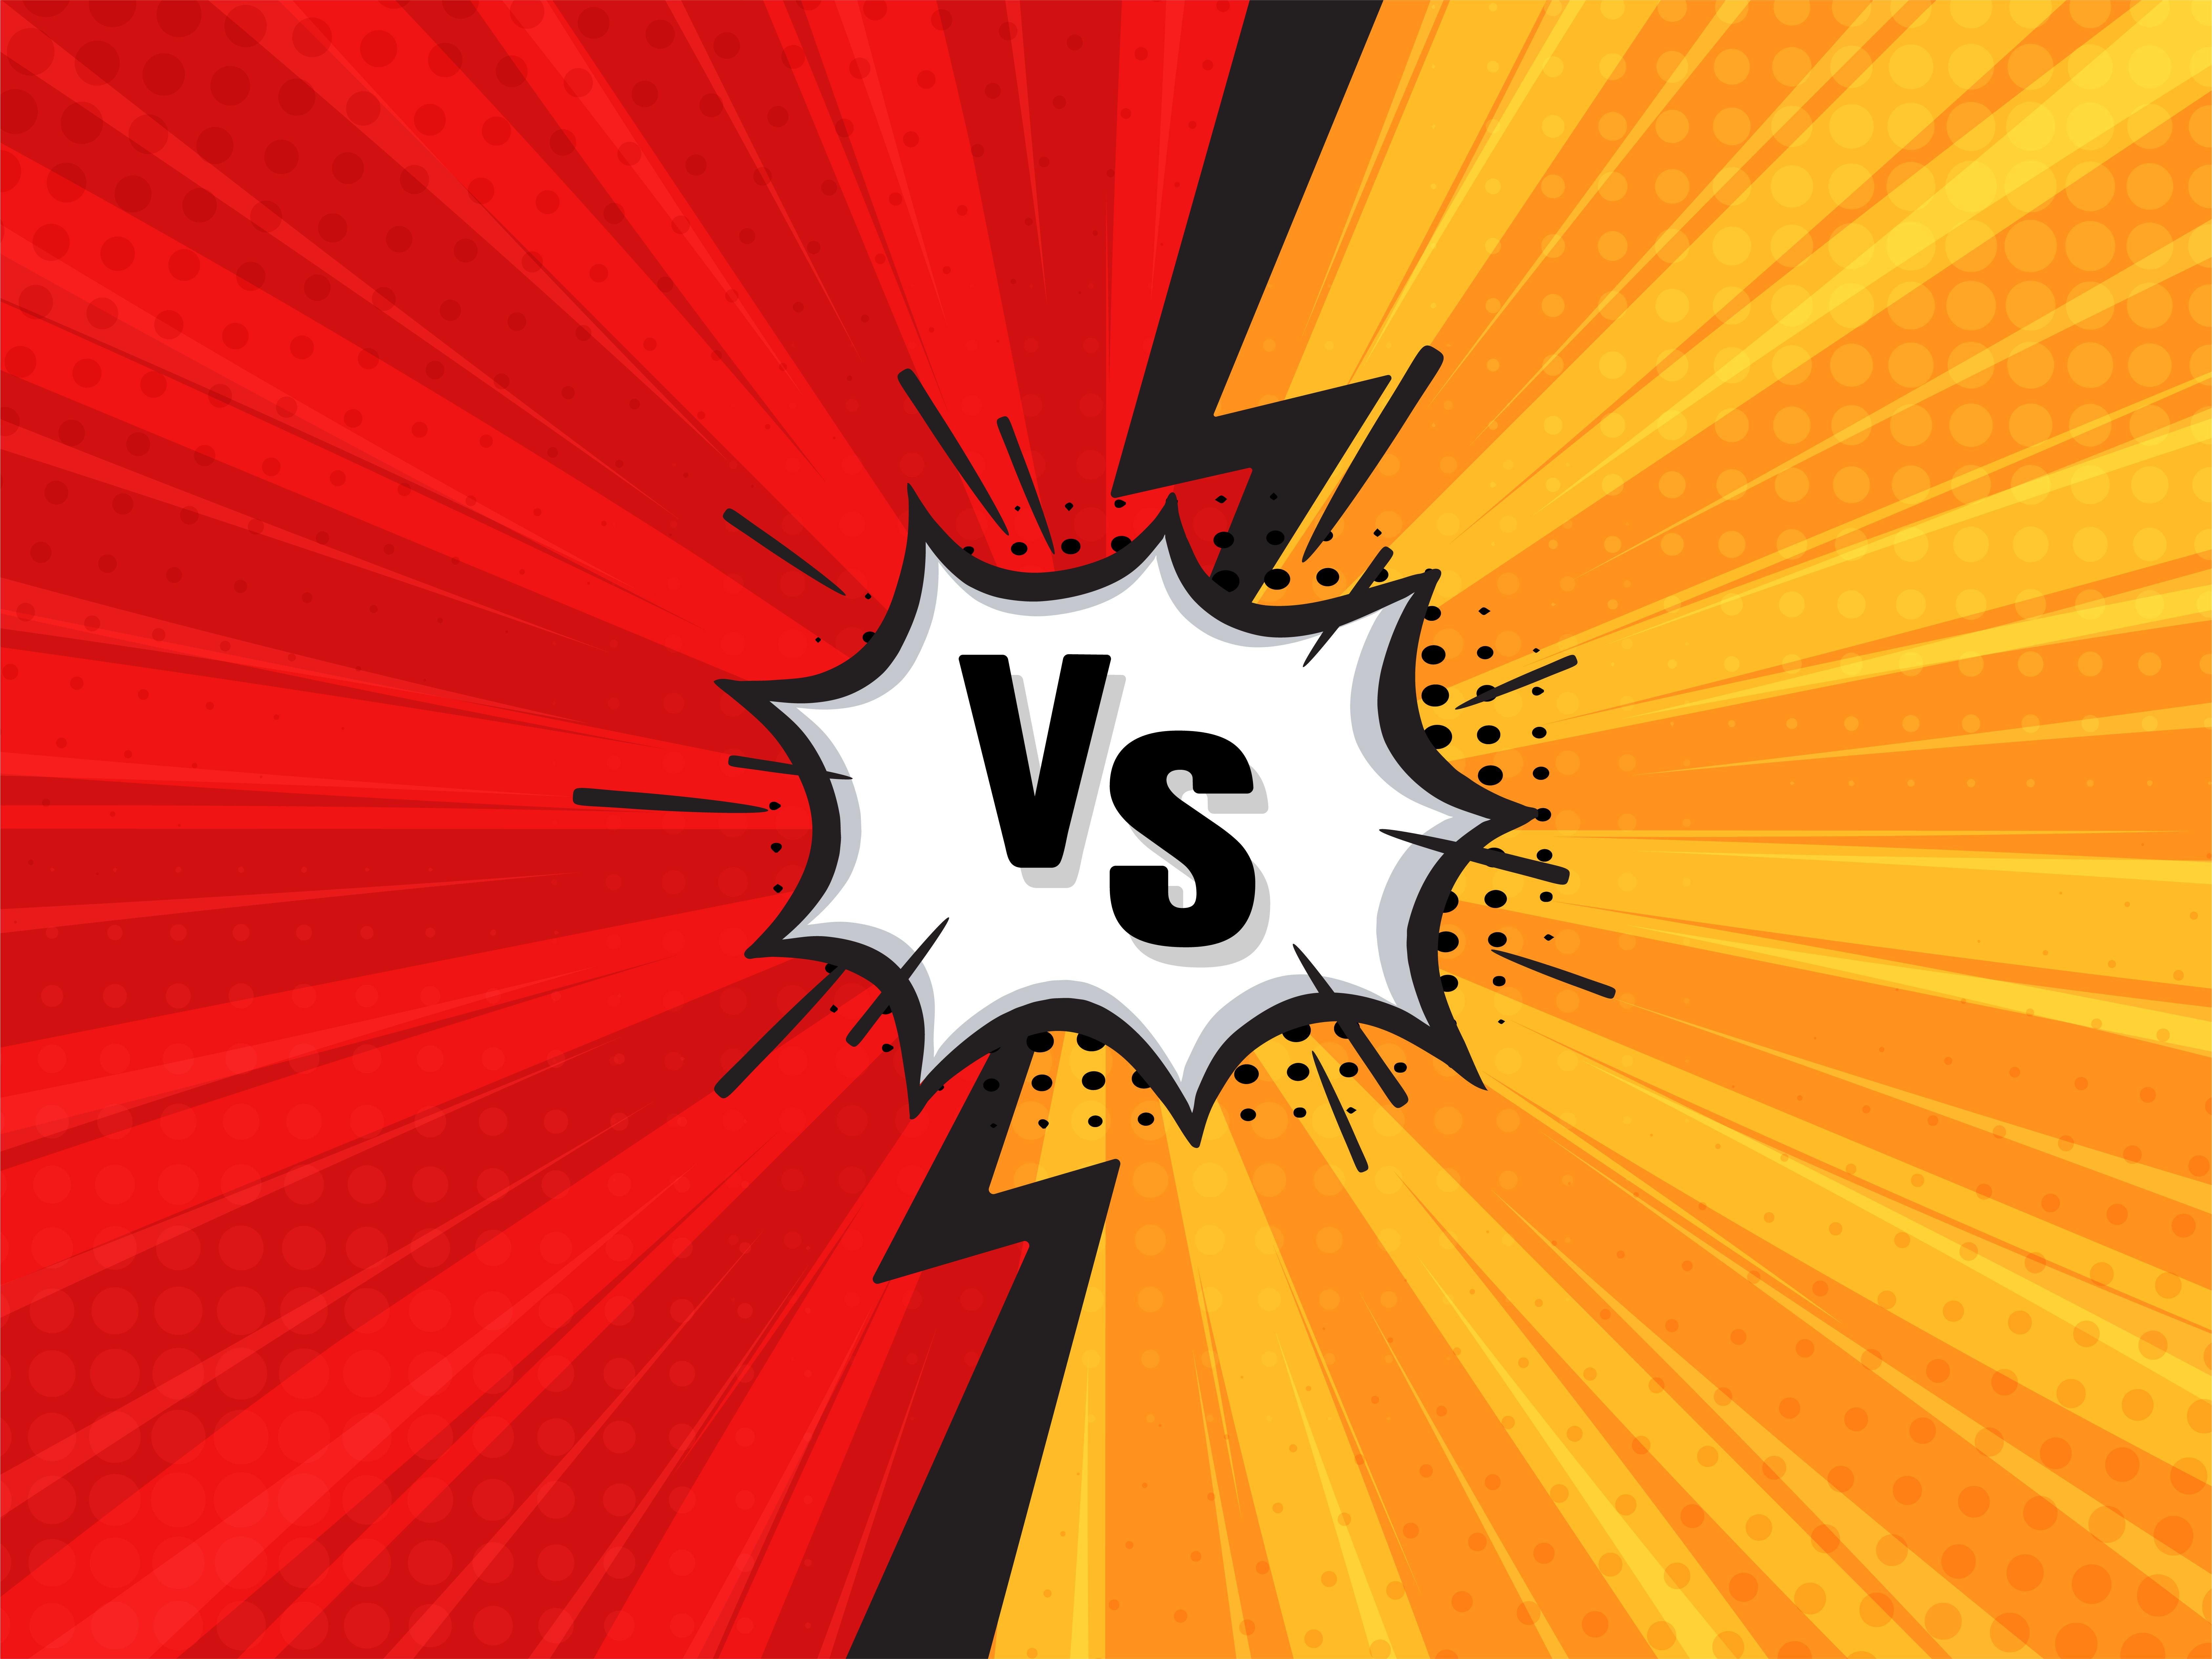 Comic Fighting Cartoon Background Red Vs Yellow Vector Illustration Download Free Vectors Clipart Graphics Vector Art